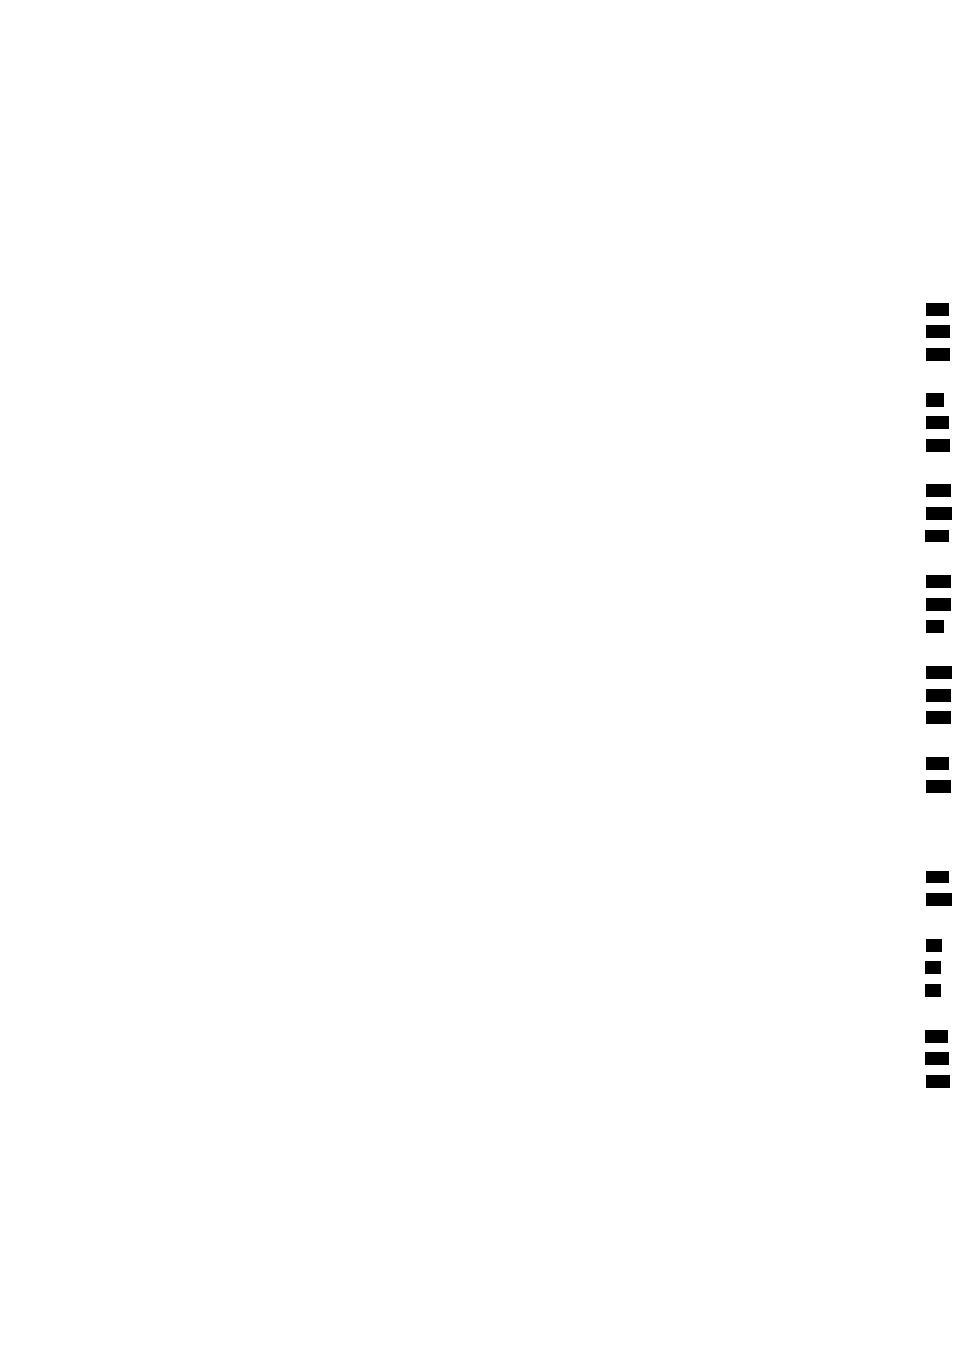 Electrolux Zb 2901 инструкция - картинка 1